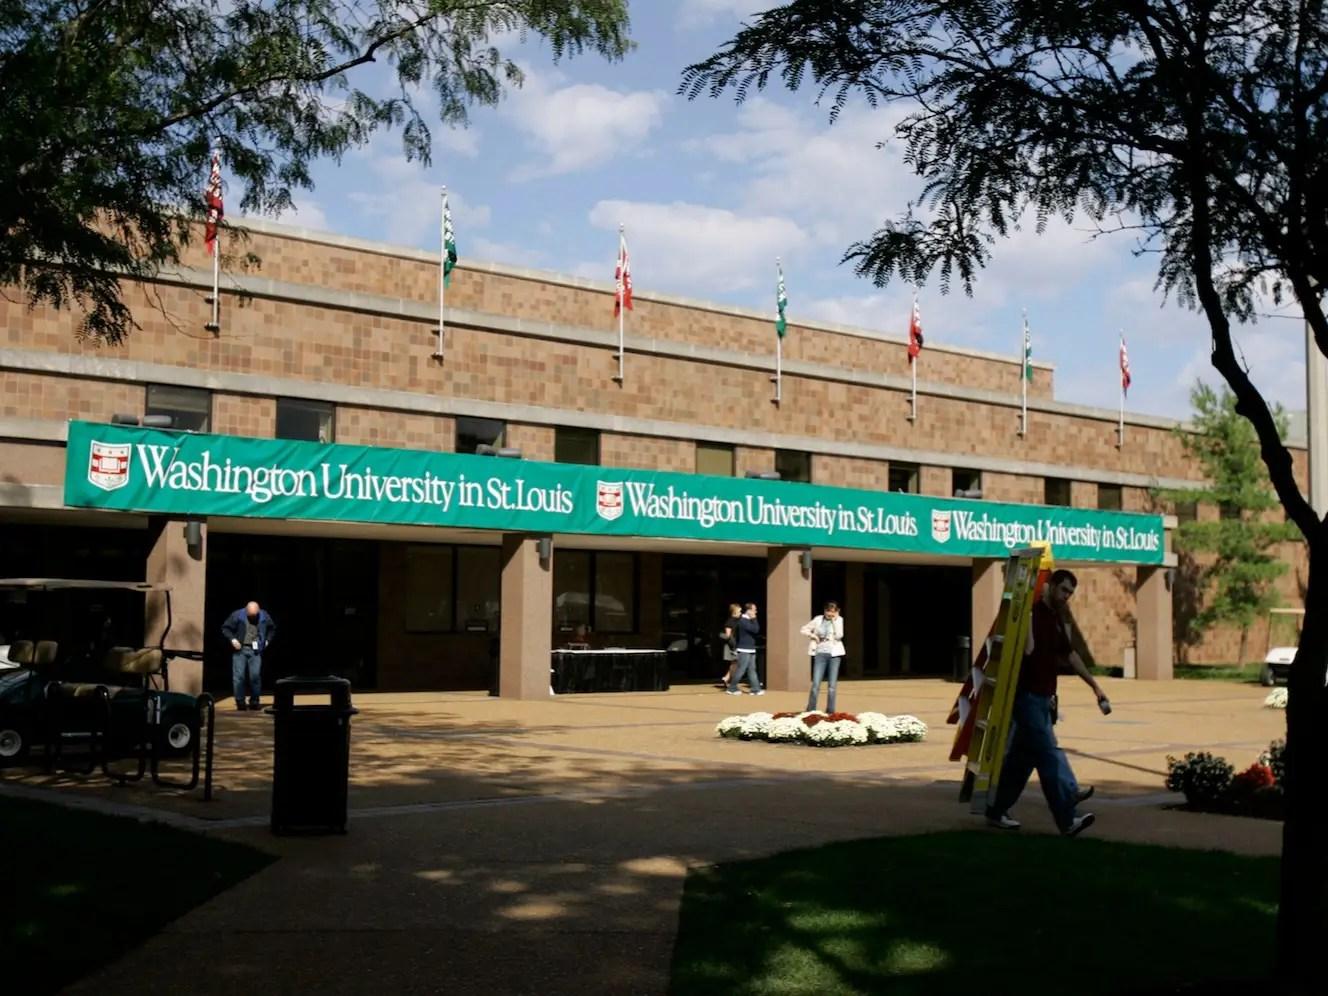 27. Washington University in St. Louis